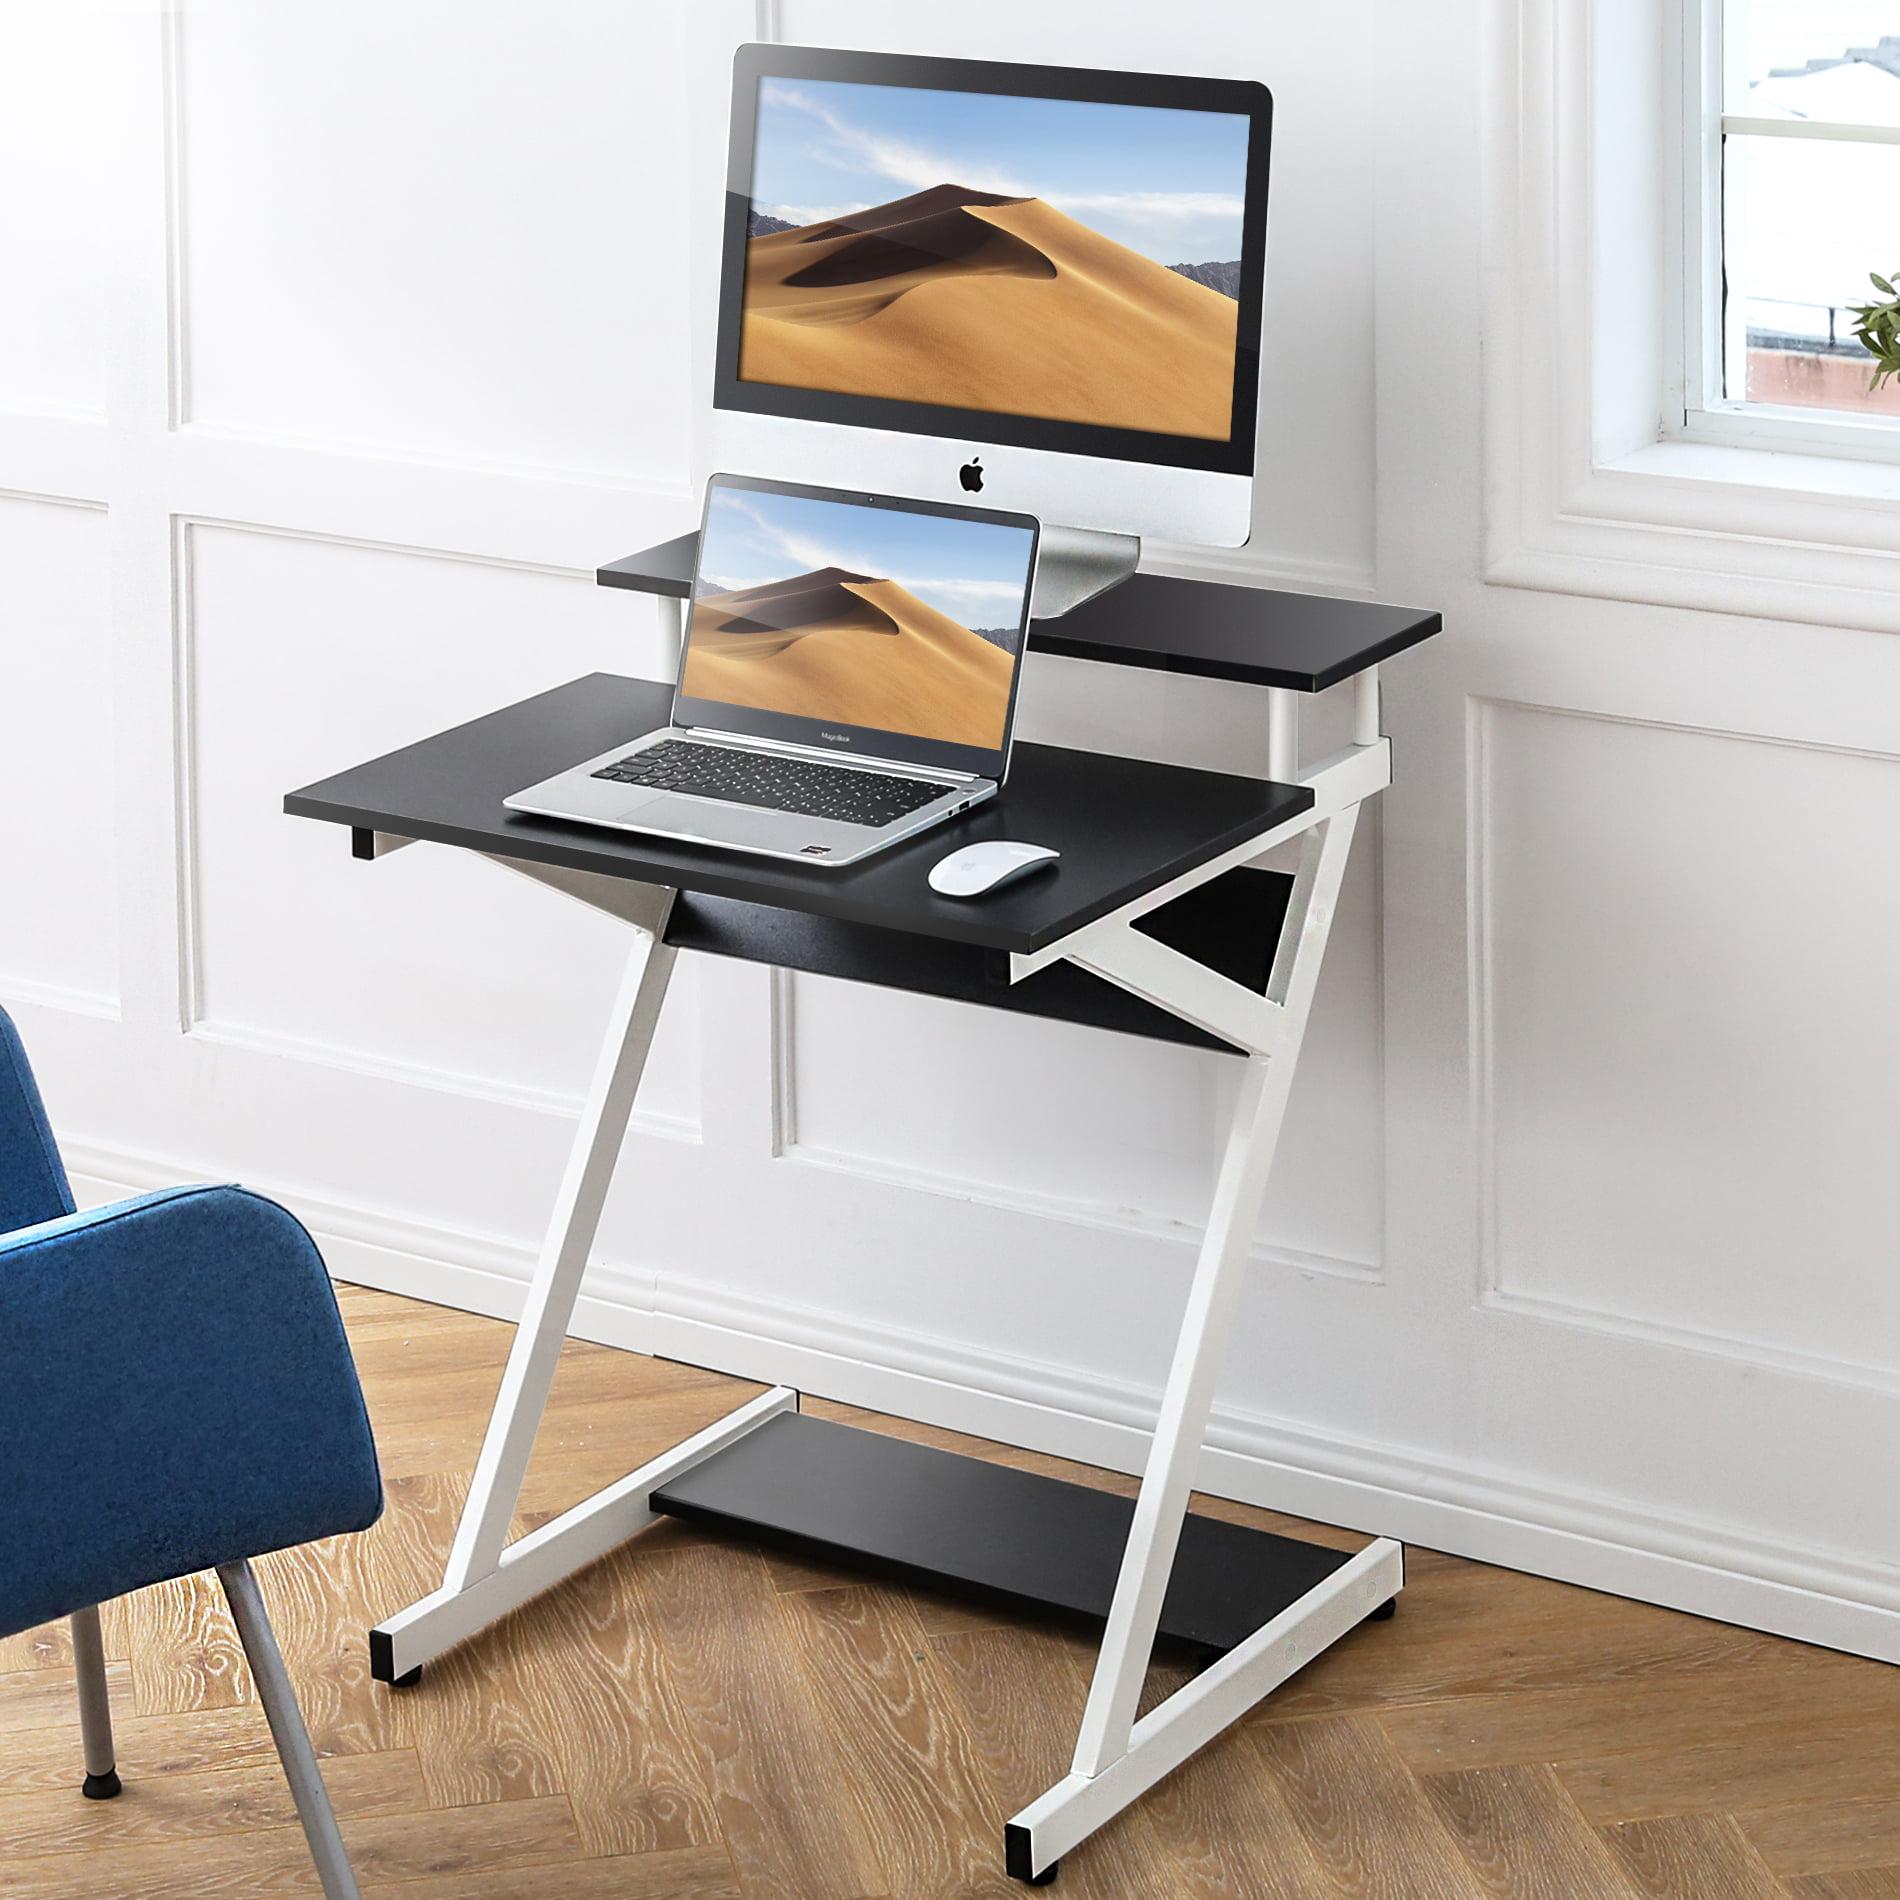 Fitueyes Computer Desk For Small Spaces Corner Desk Study Writing Desk With Shelf Cd307002ww Walmart Com Walmart Com